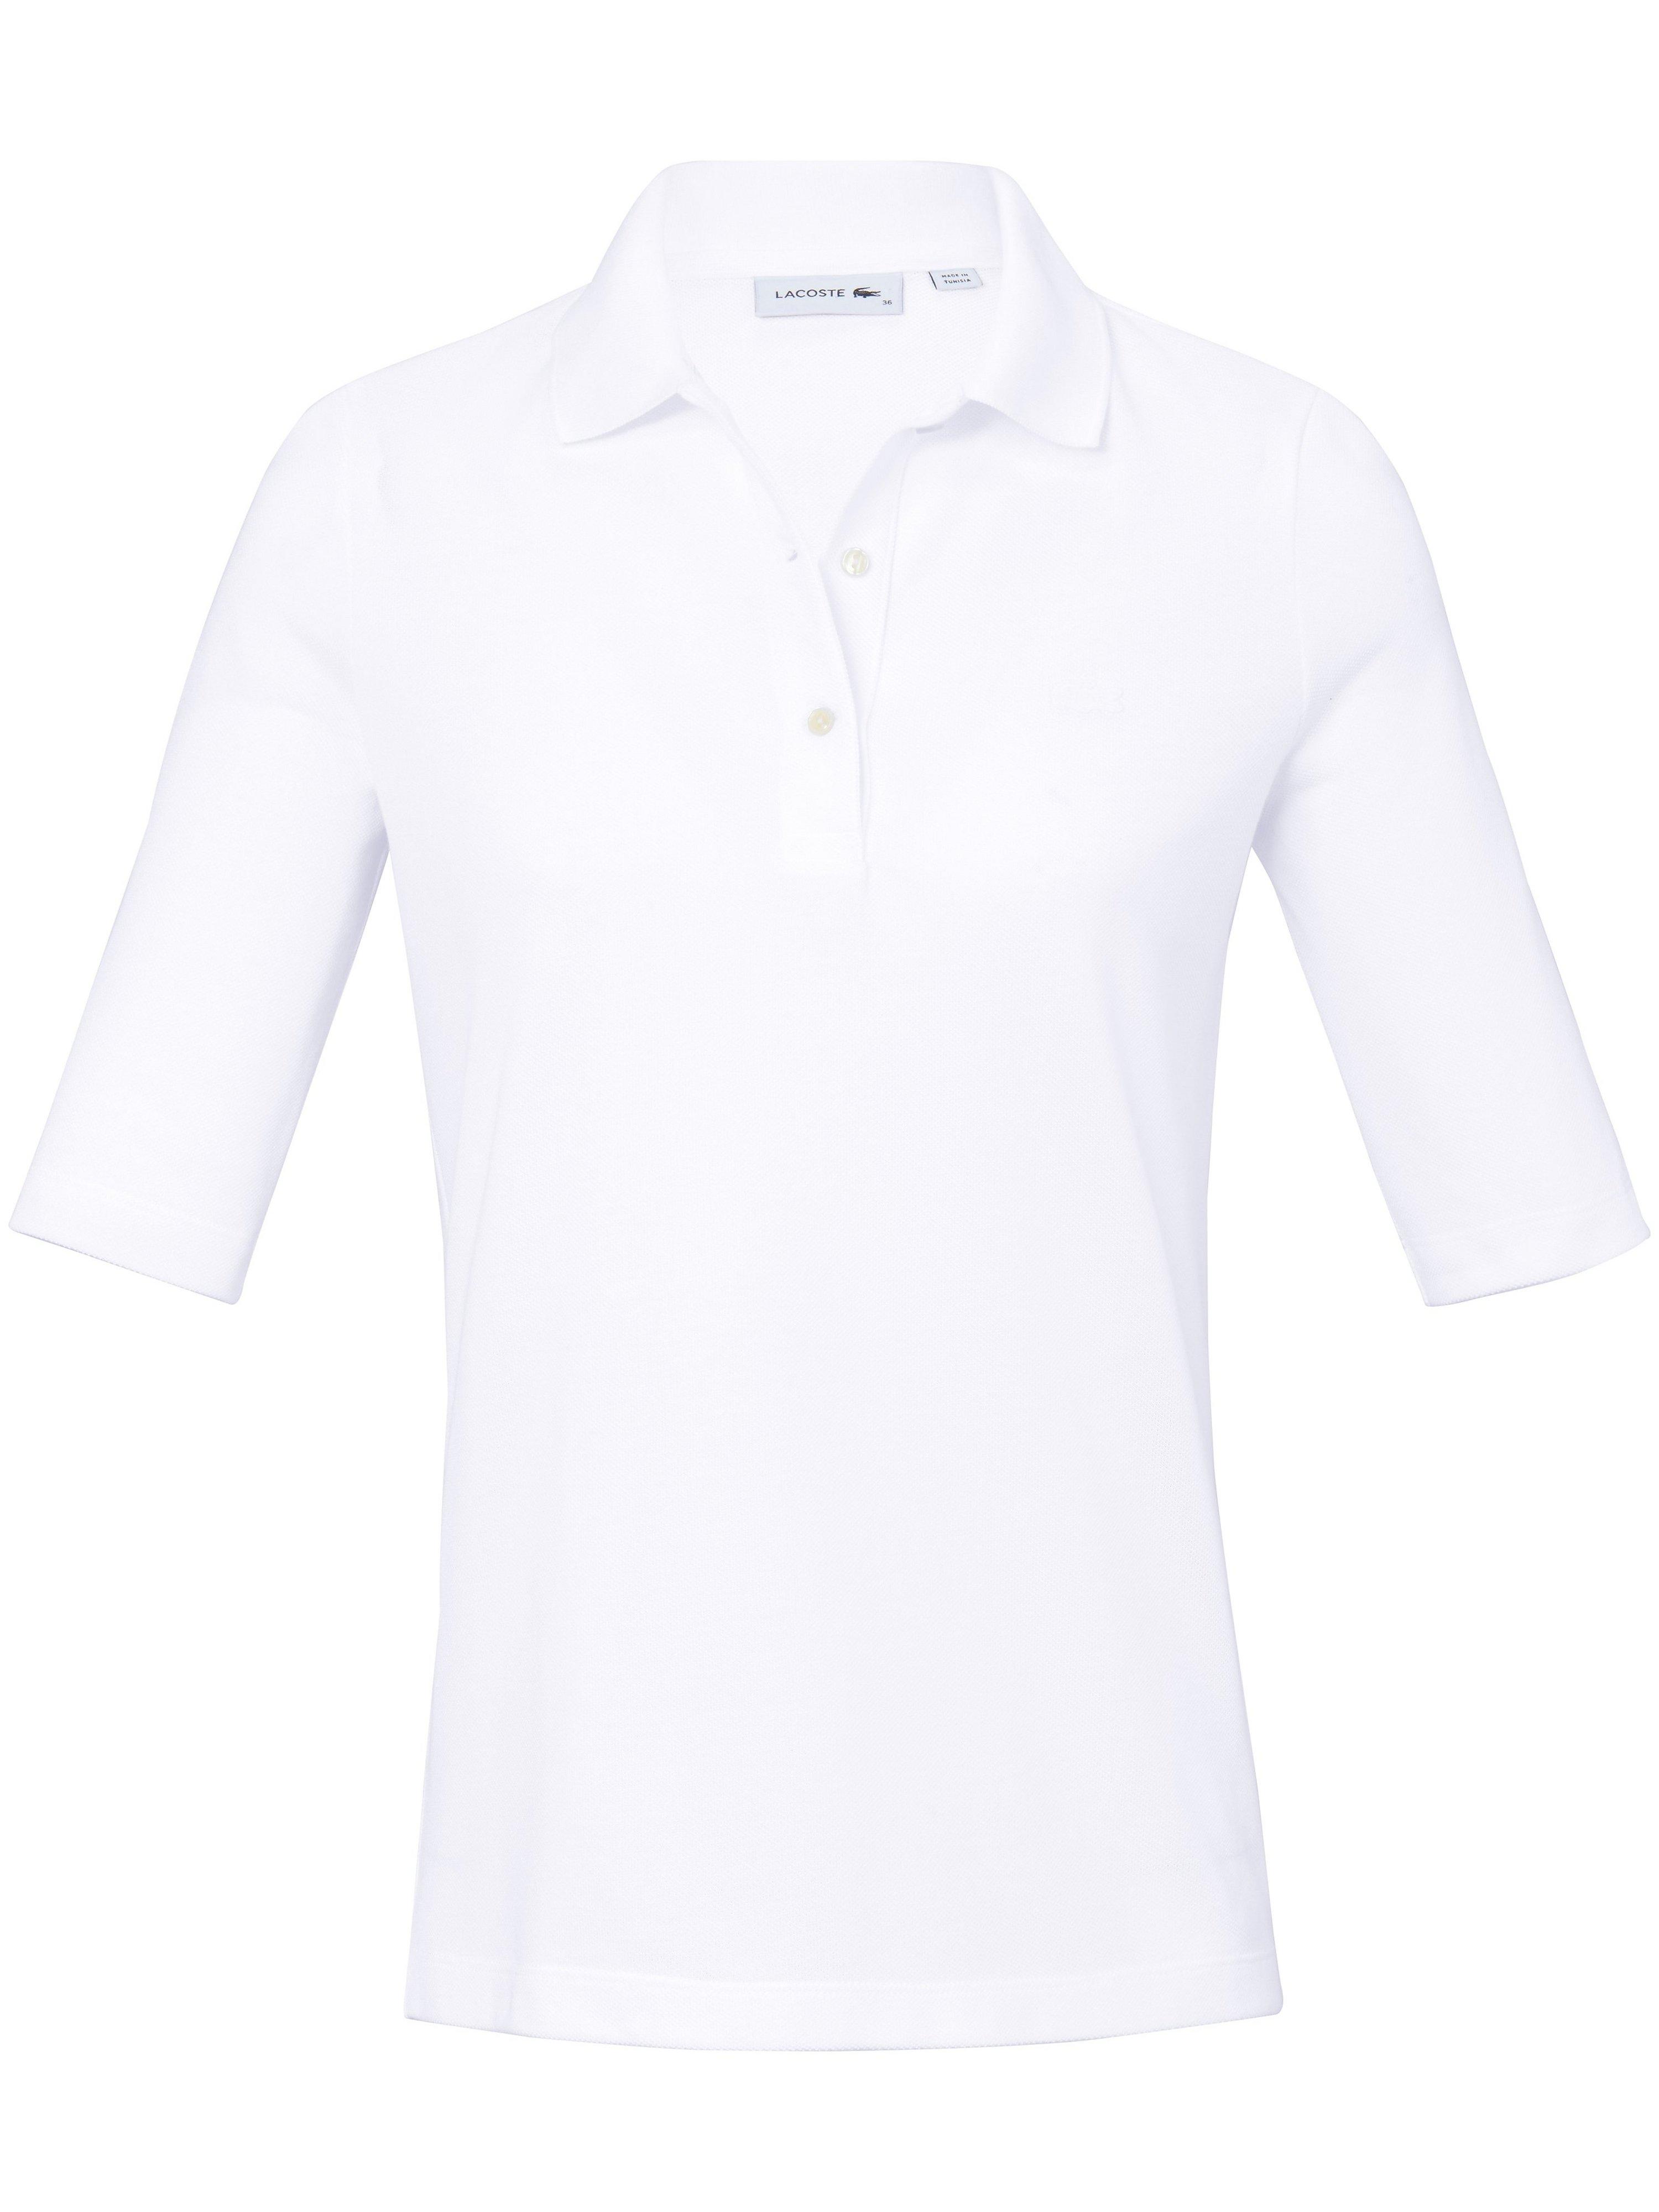 Poloshirt 1/2-lange ærmer 100% bomuld Fra Lacoste hvid